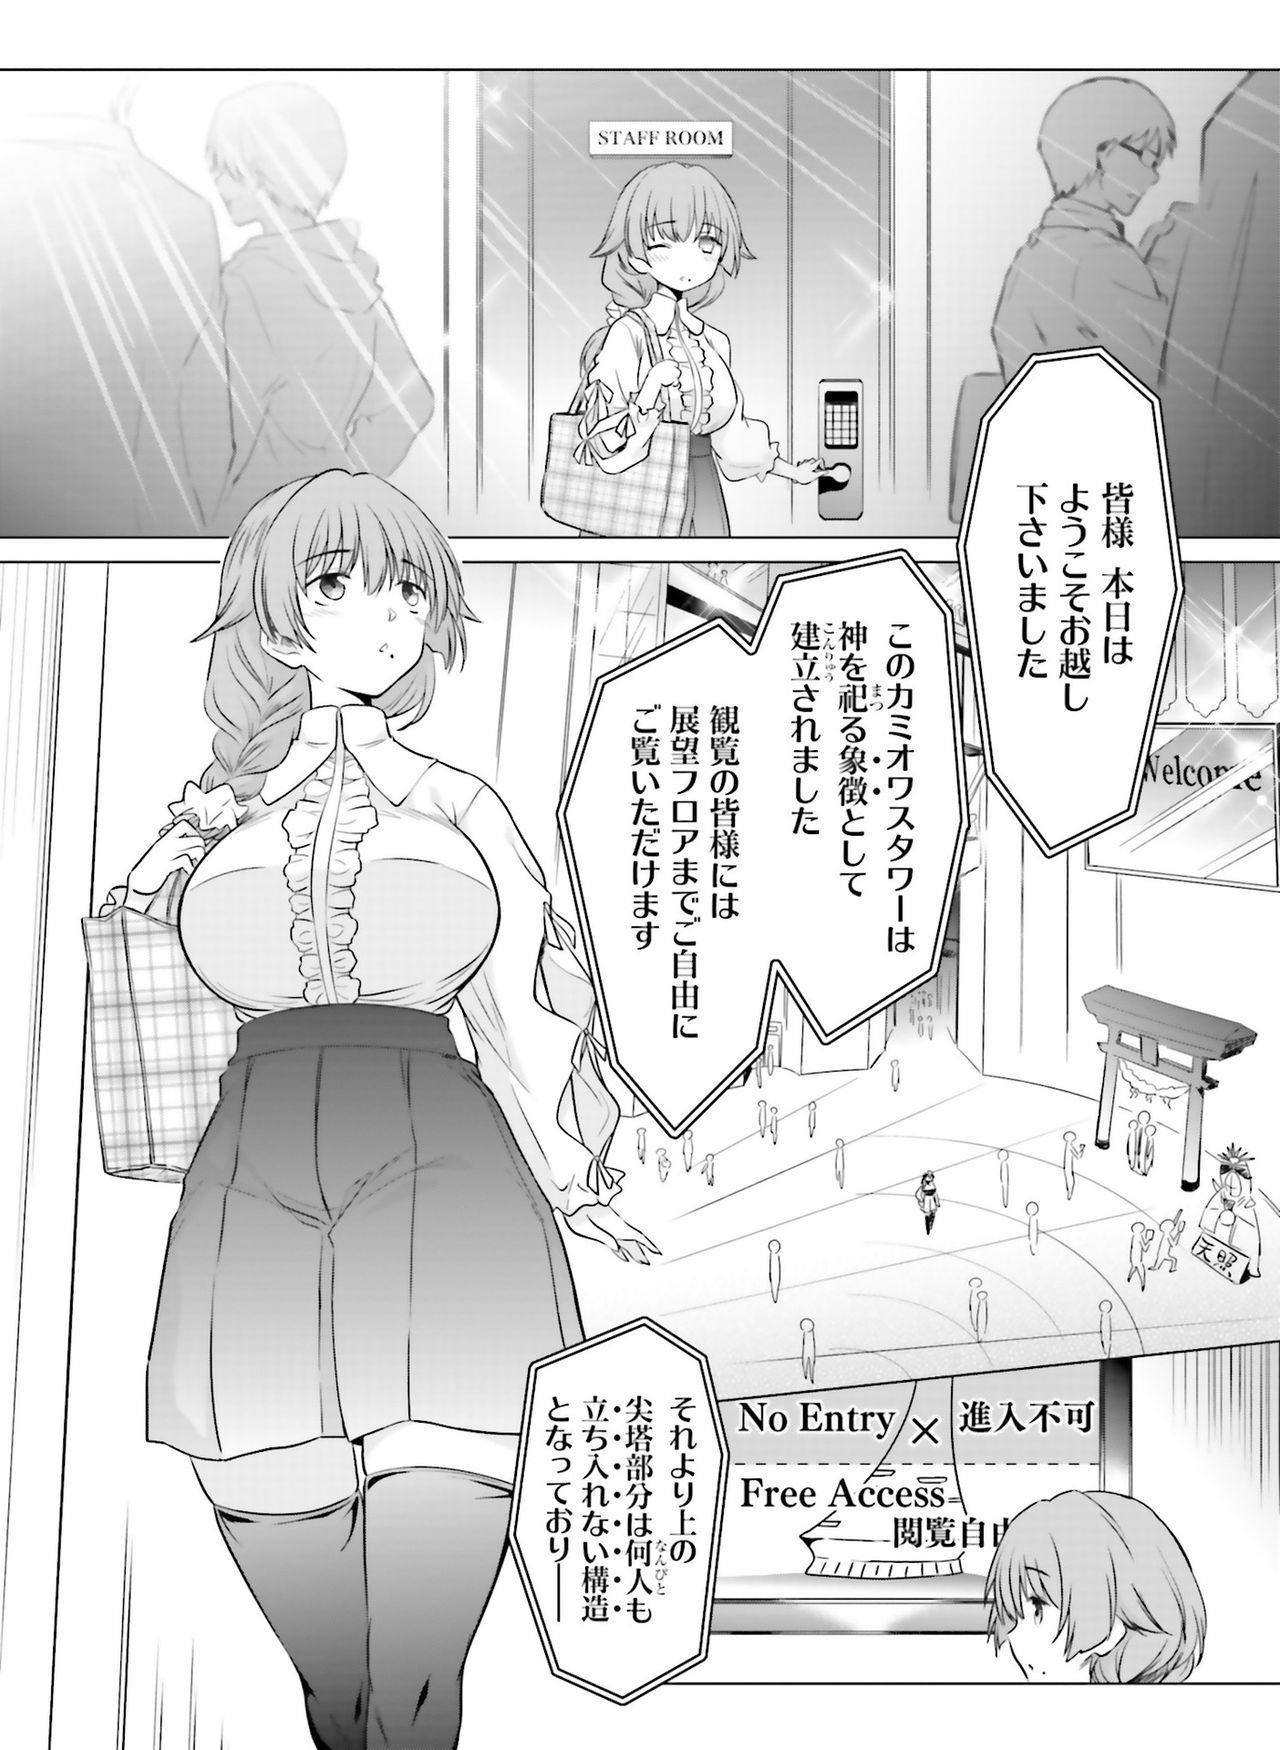 Dengeki Moeoh 2019-12 134